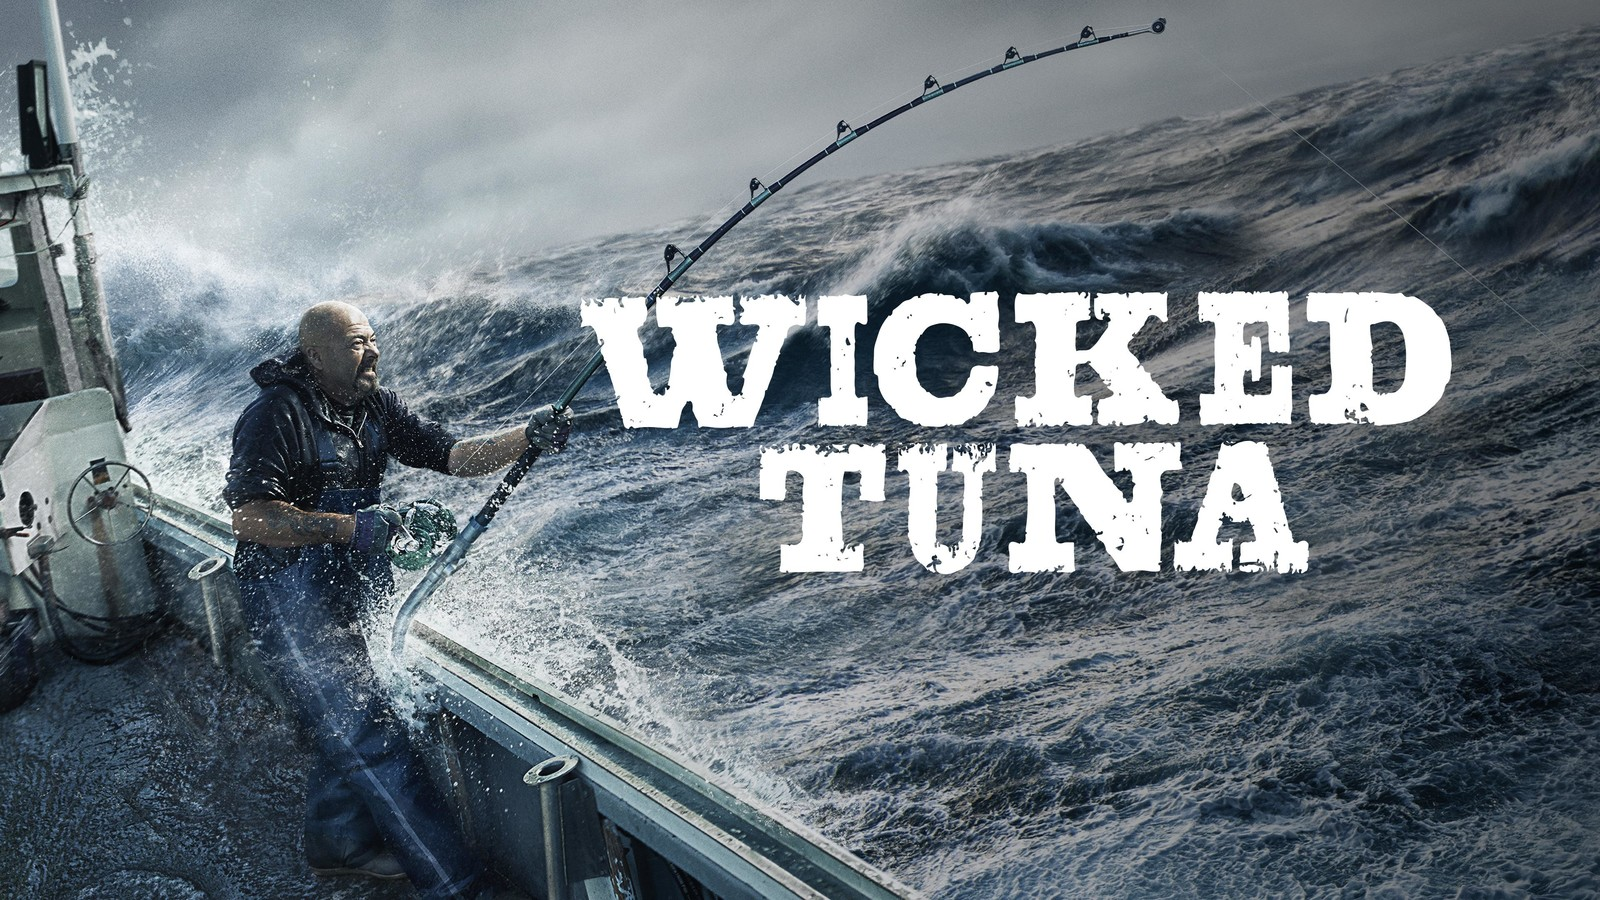 watch wicked tuna season 7 free online